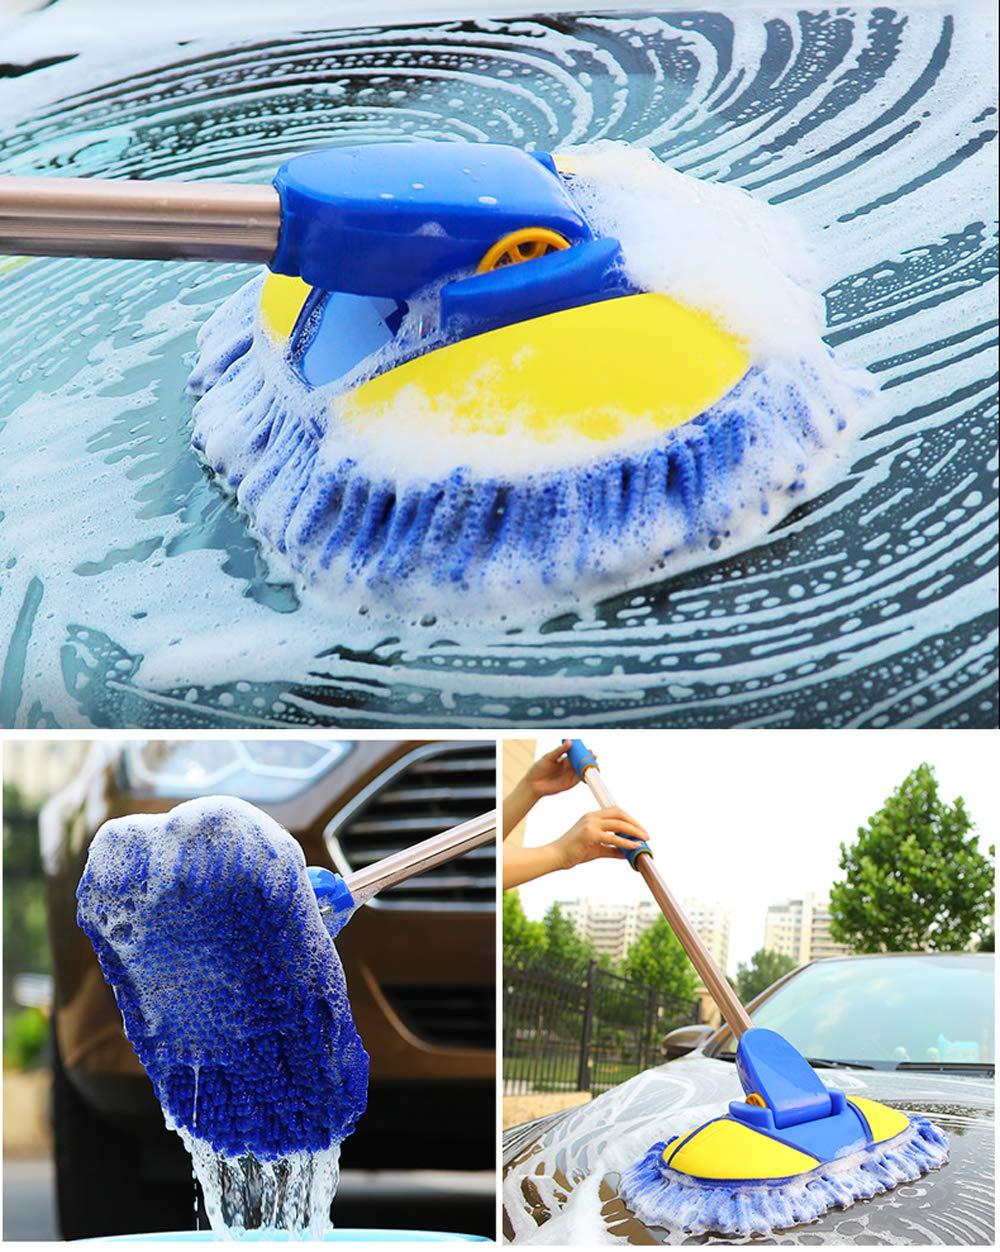 Innoter Ultra Plush Telescopic Chenille Car Wash Brush Rotation Car Wash Brush Microfibre Car Drying Towels Super Absorbent Detachable